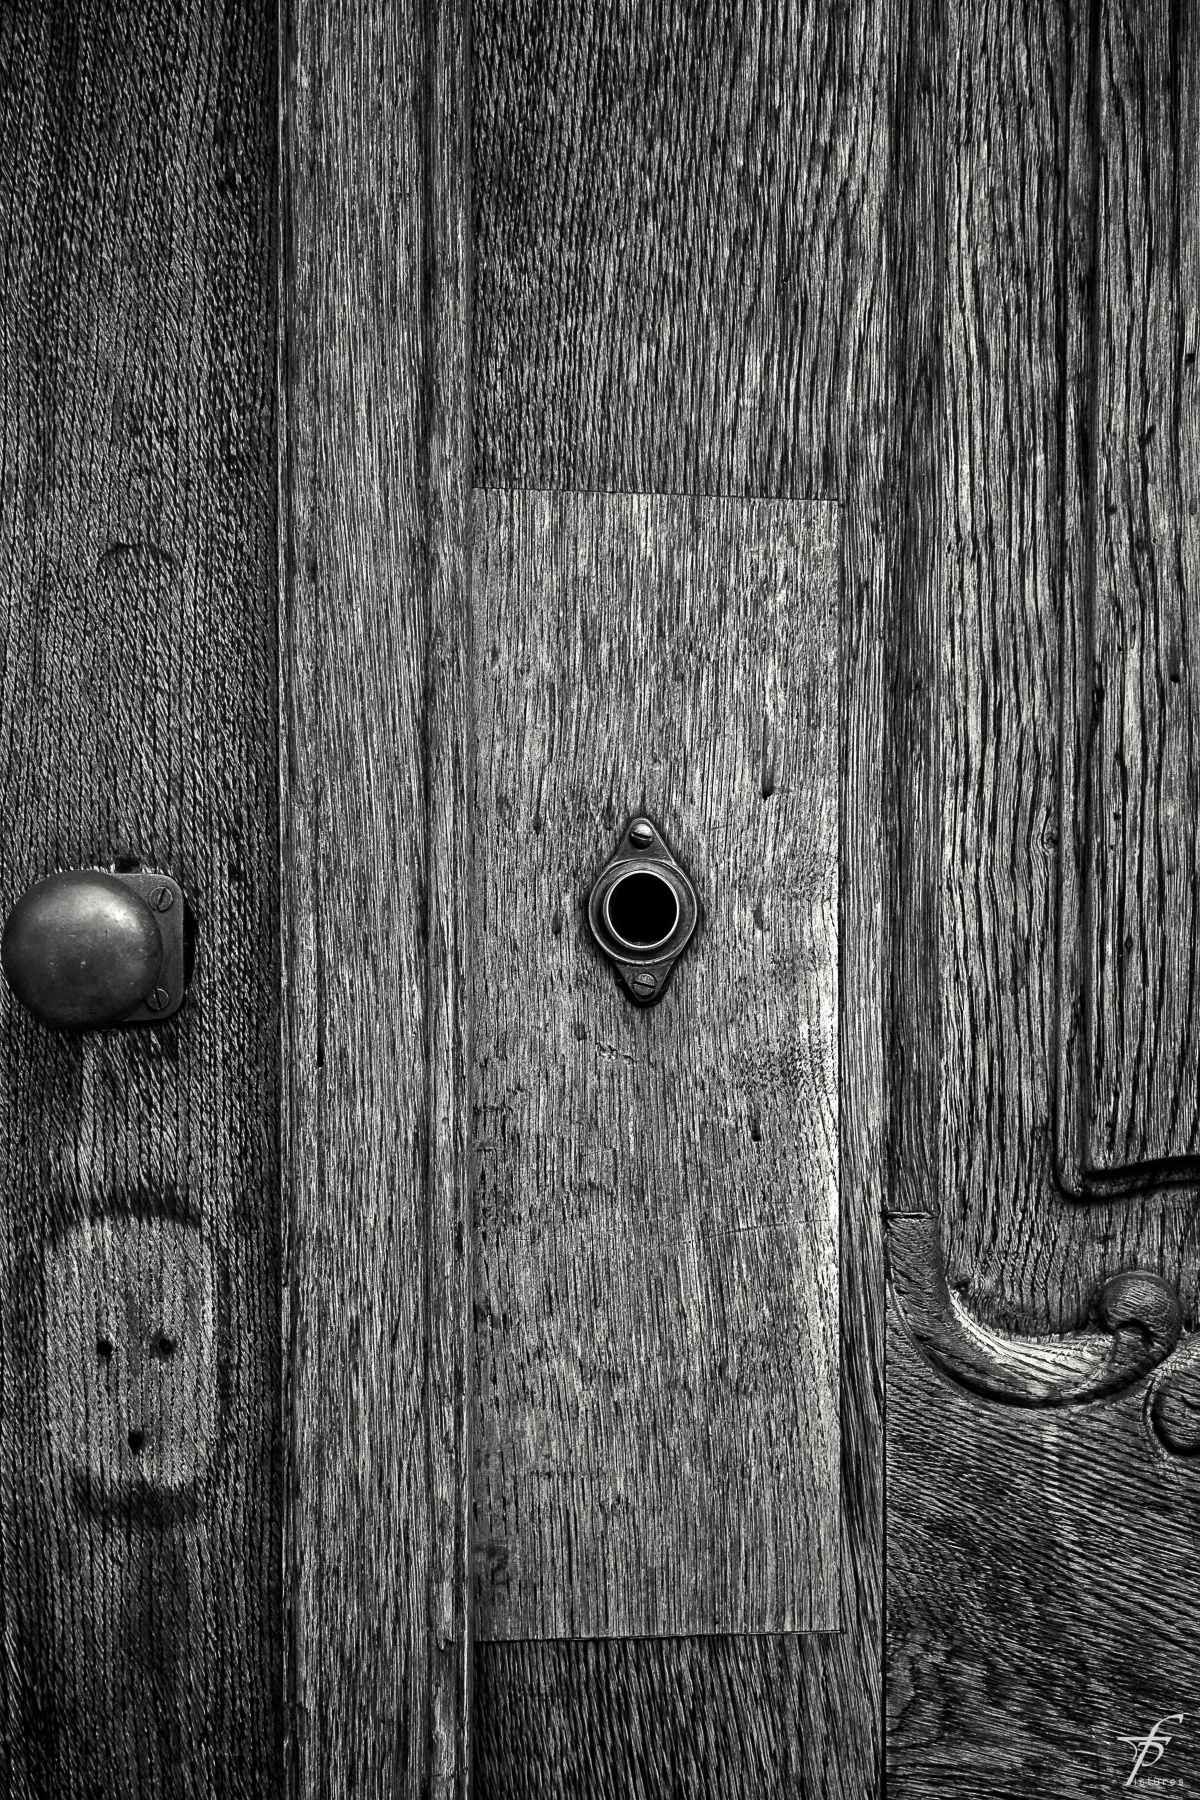 Keyhole, Lock, Wooden, Key, Door, HQ Photo